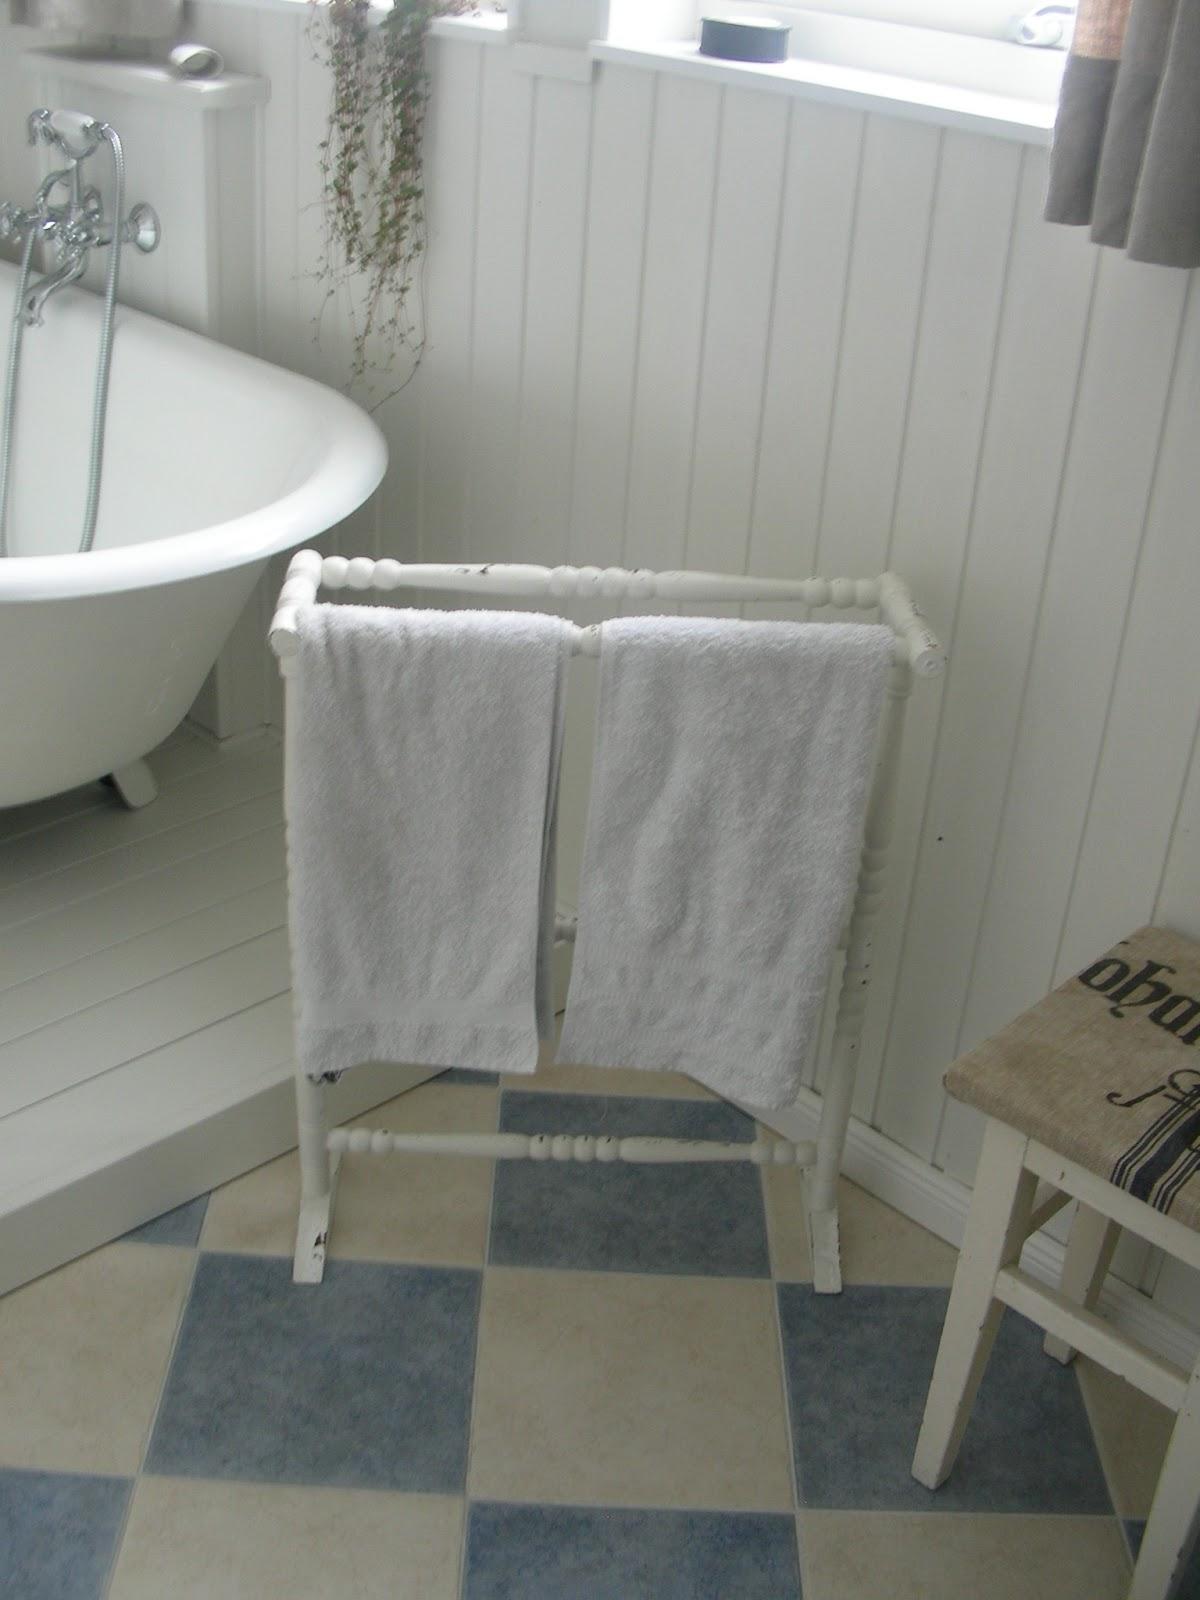 shabby home badezimmer. Black Bedroom Furniture Sets. Home Design Ideas